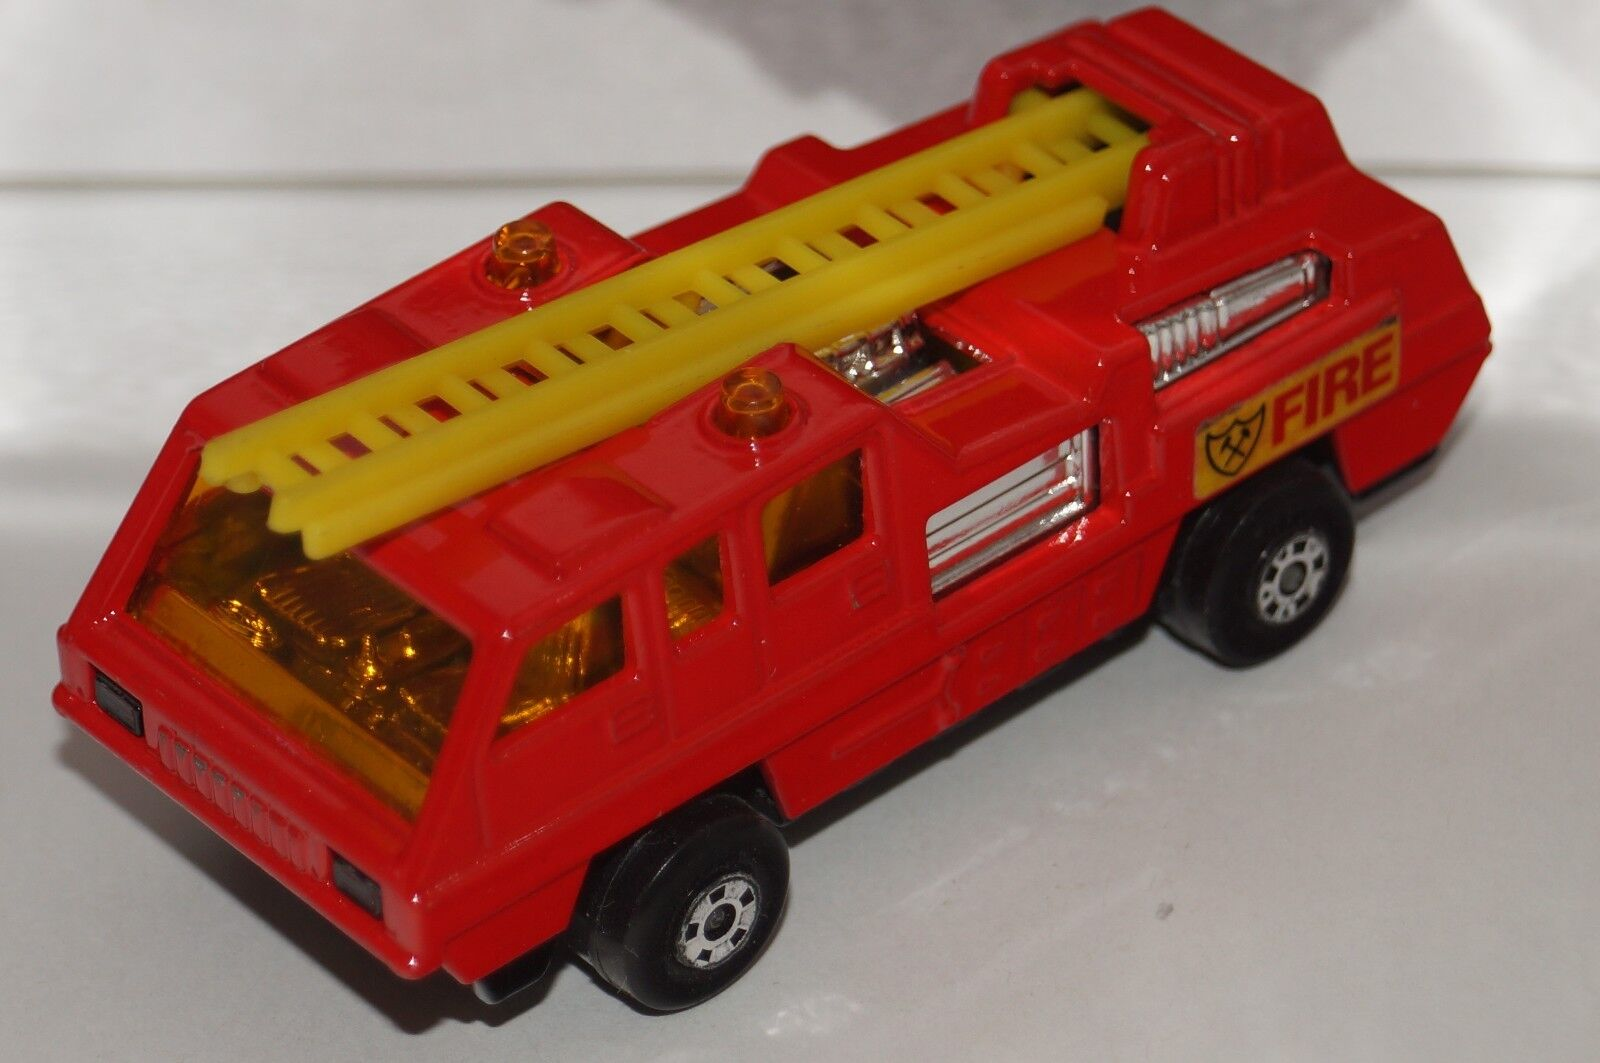 Original Matchbox Superfast-Blaze Buster-no 22-Coloreee rosso y giallo Escalera